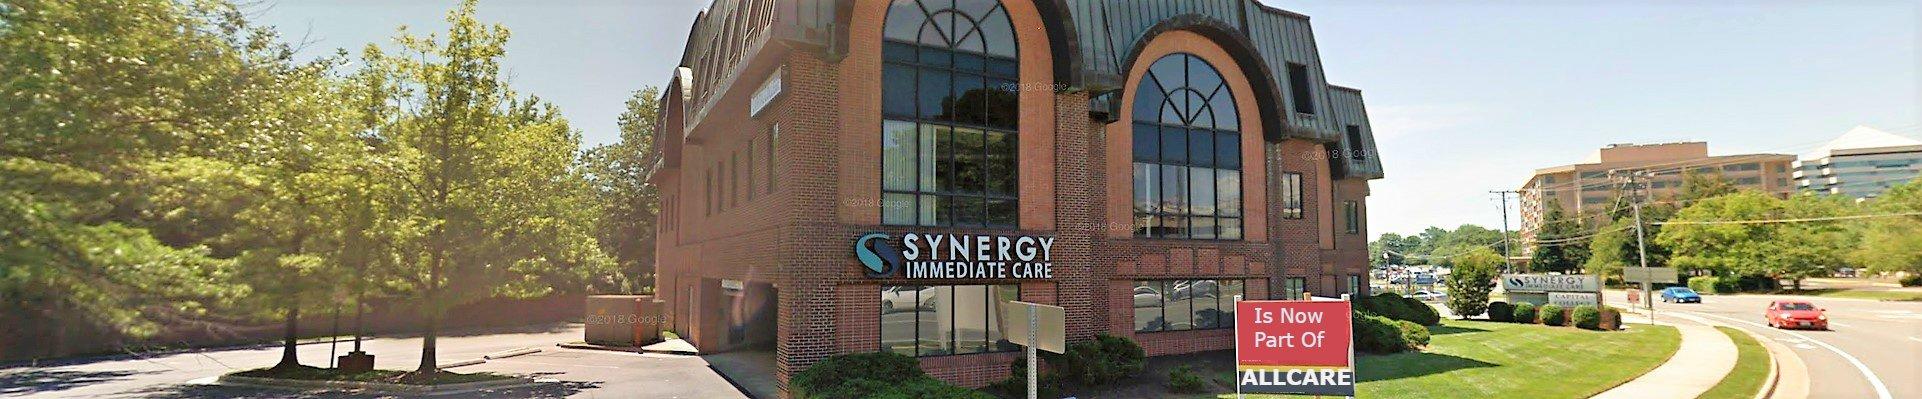 AllCare Family Medicine and Urgent Care of Tysons Corner, VA